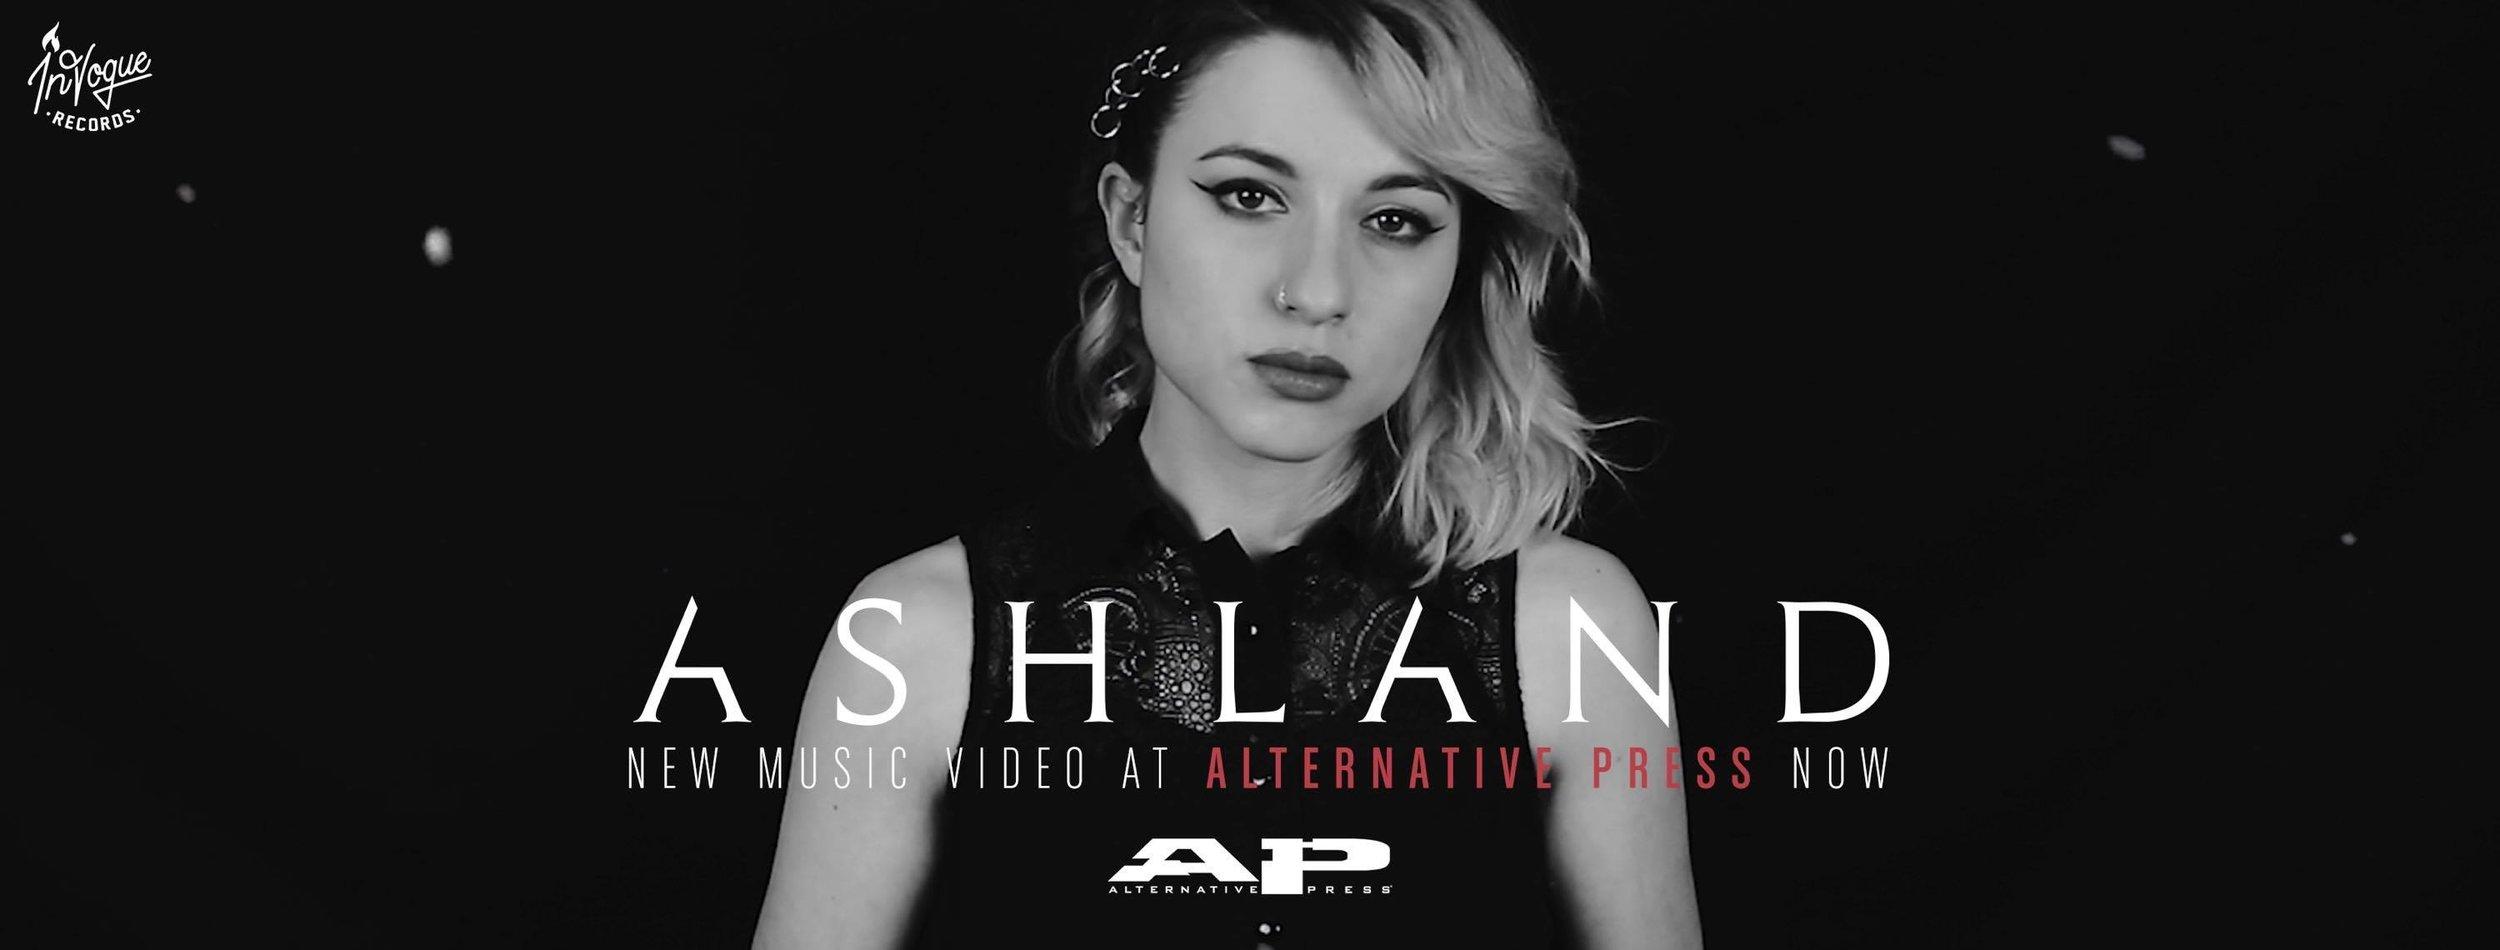 Ashland via Facebook/InVogue Records